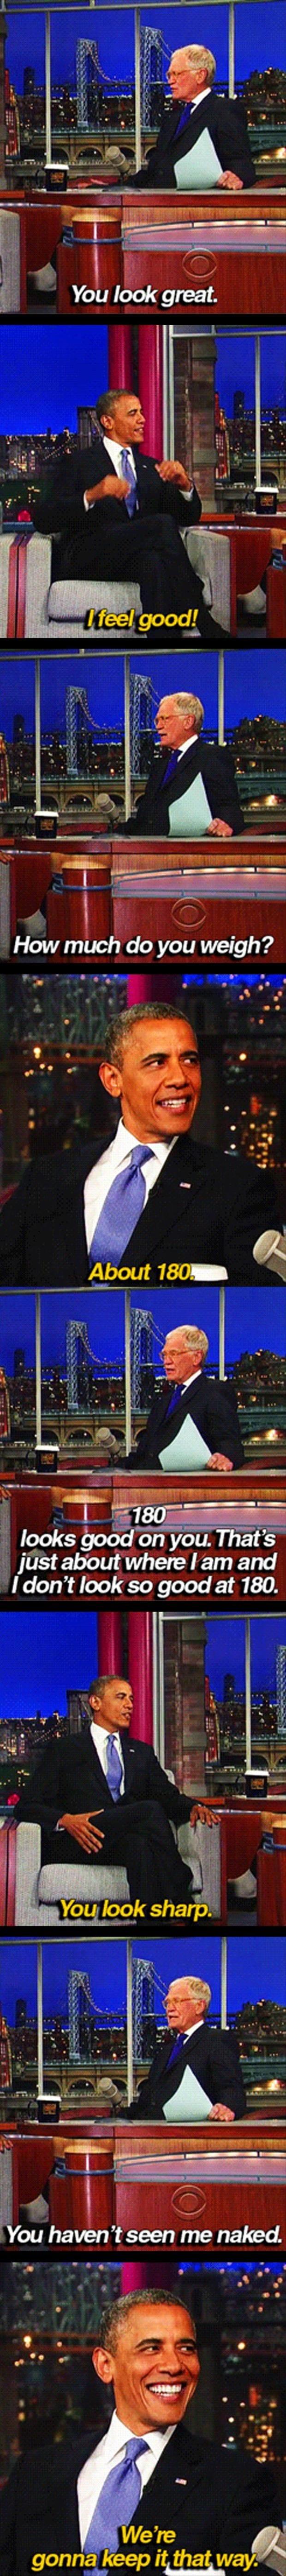 obama-and-david-letterman